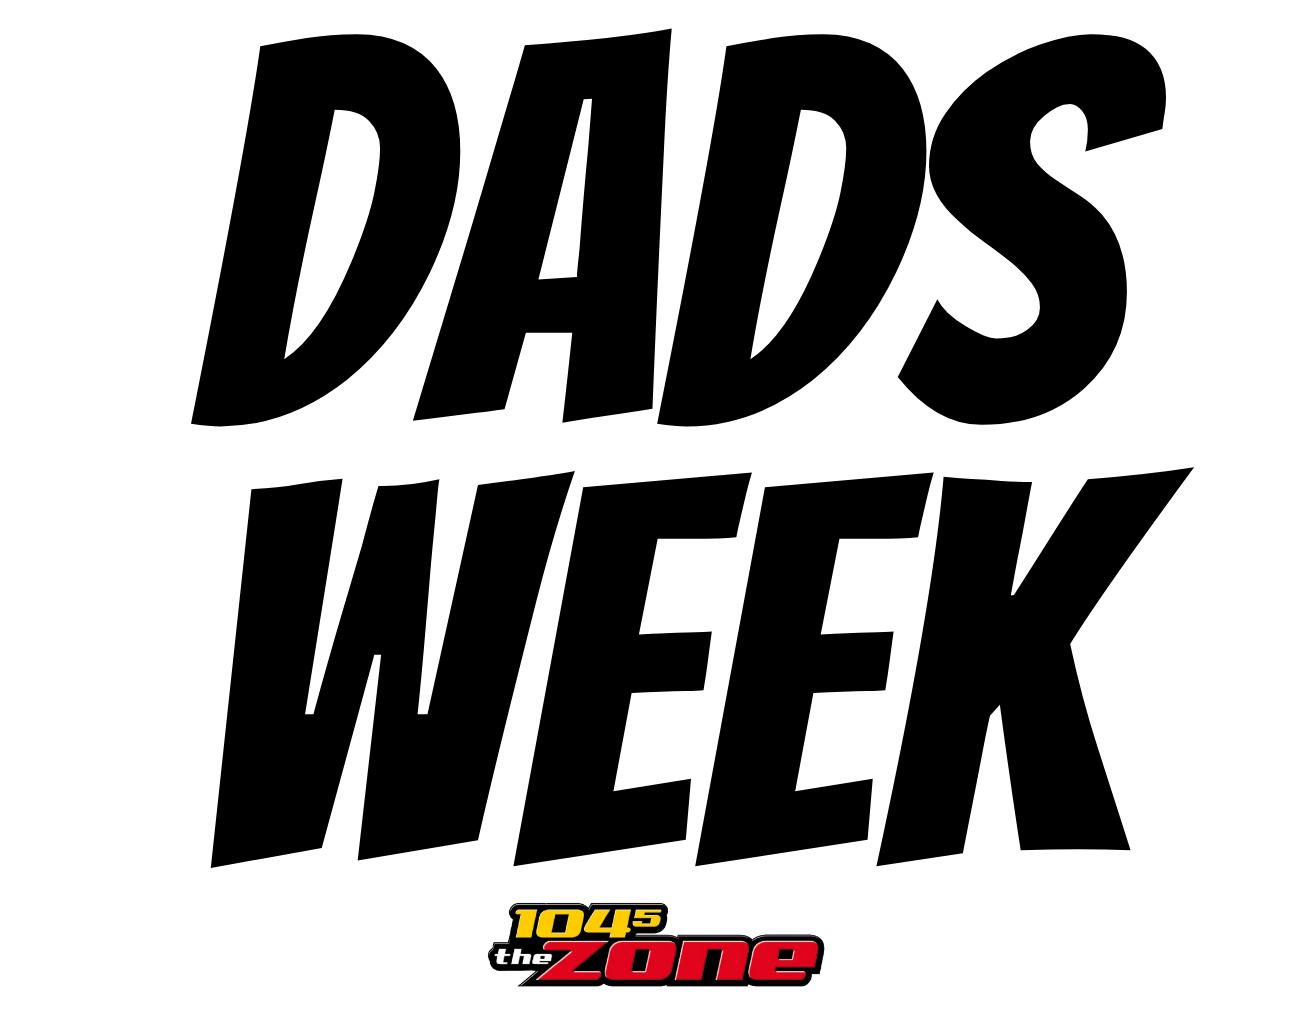 Dads Week